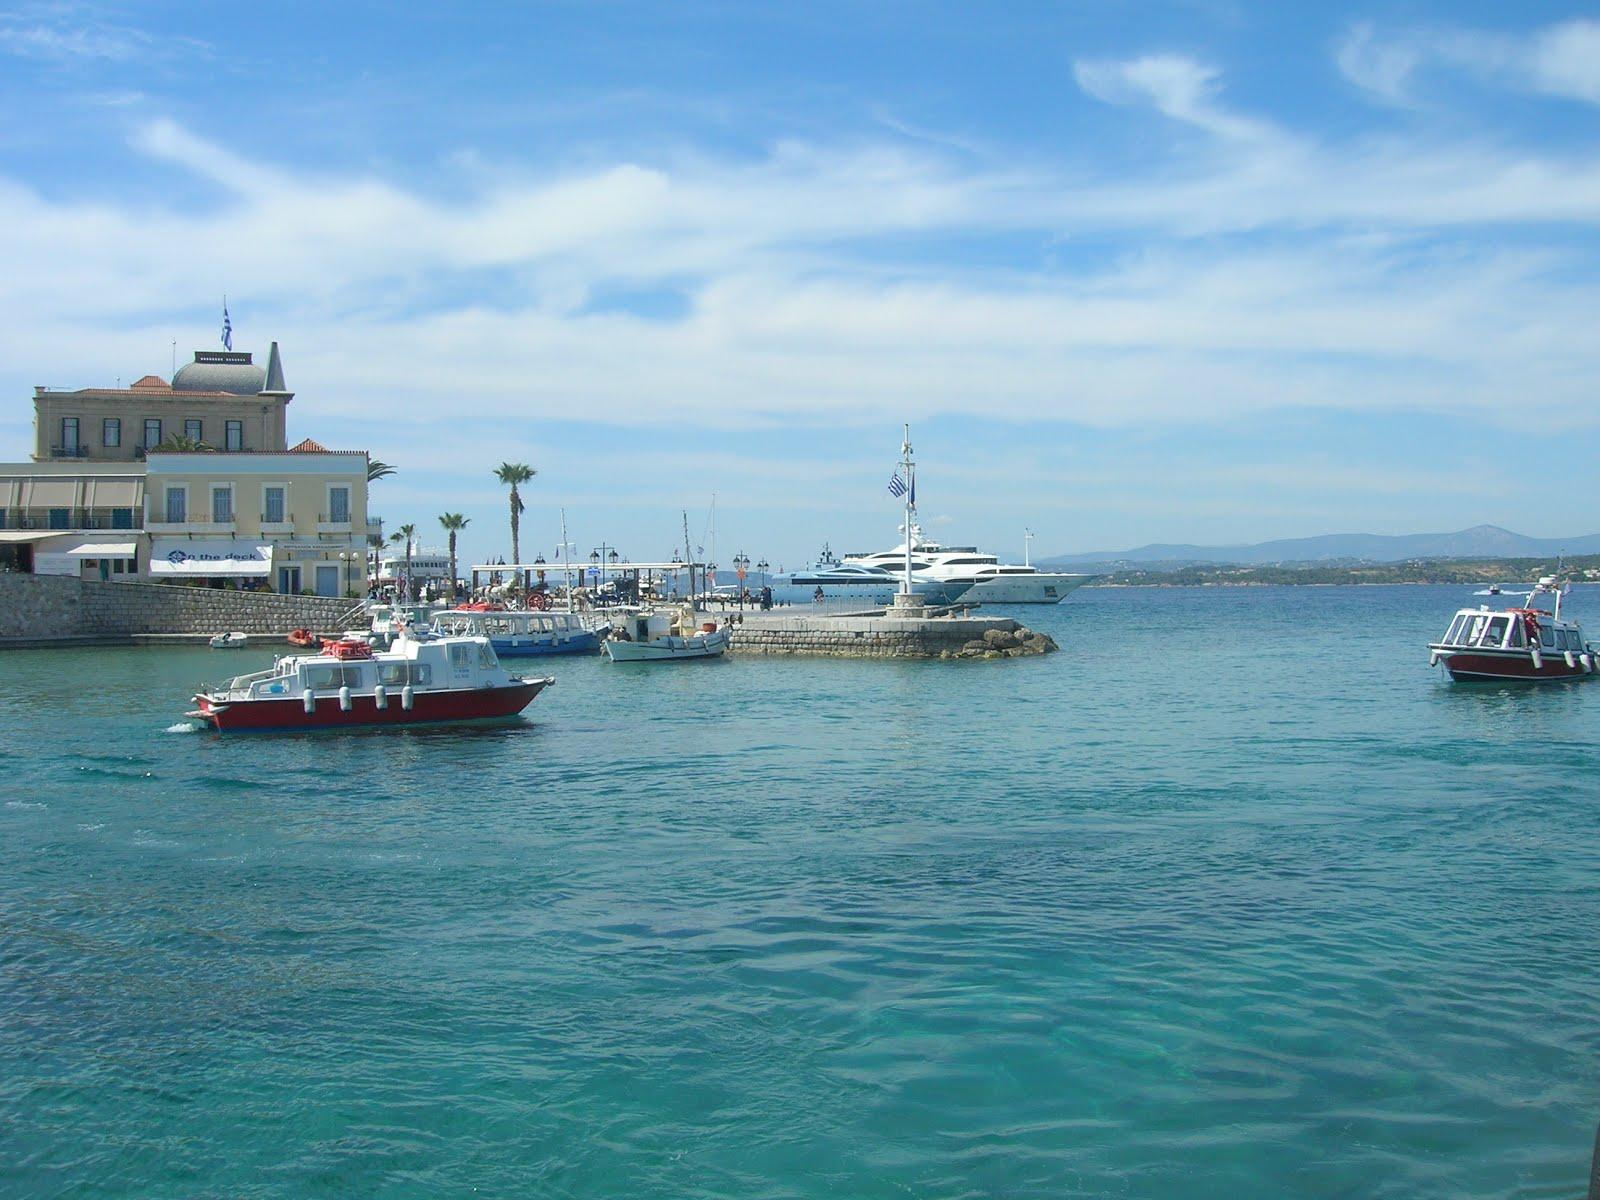 Island of Speteses